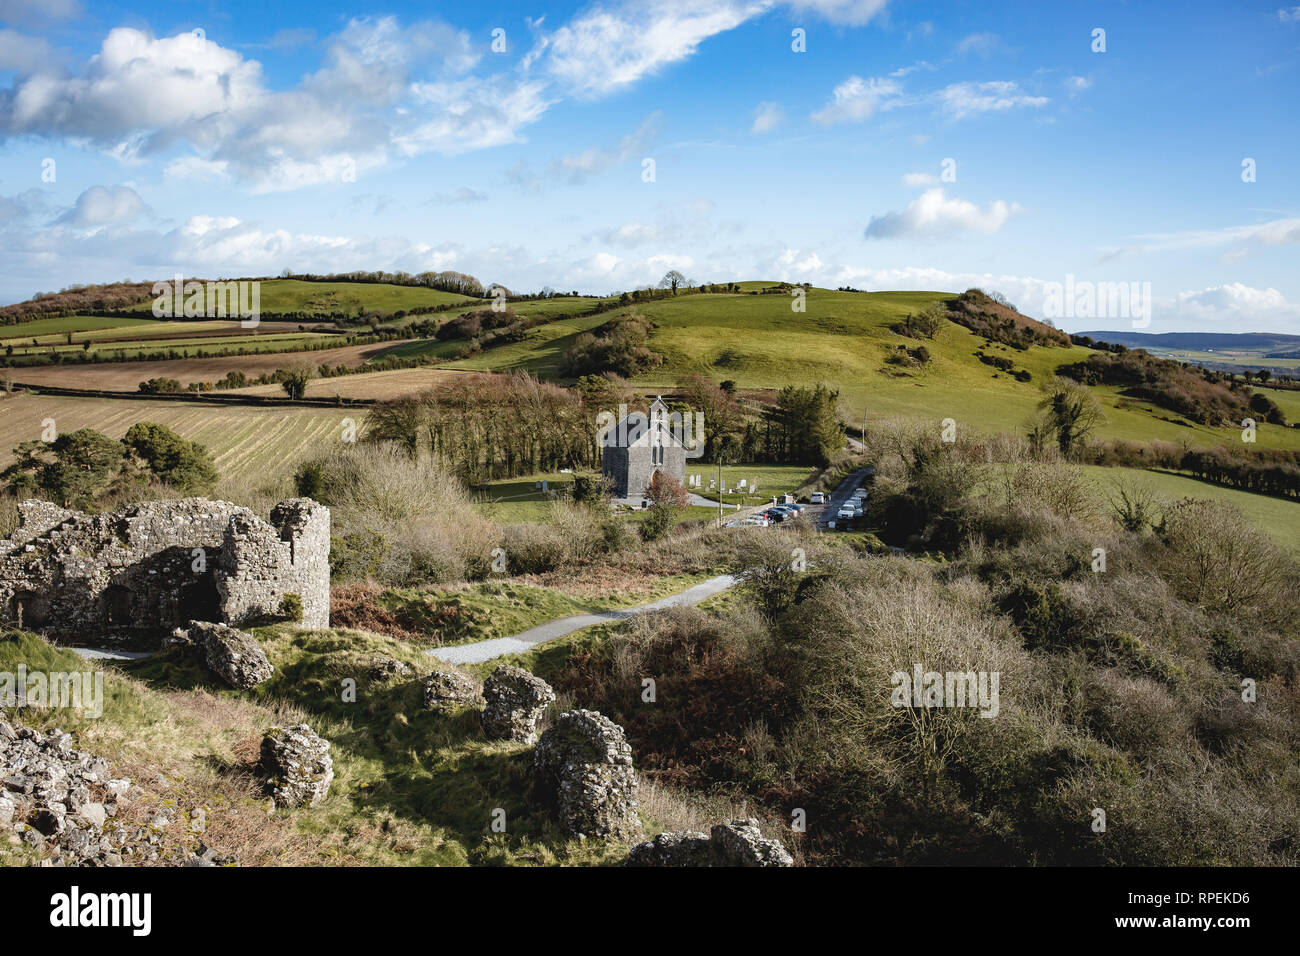 Ballintubert   Gardens & House   Ireland